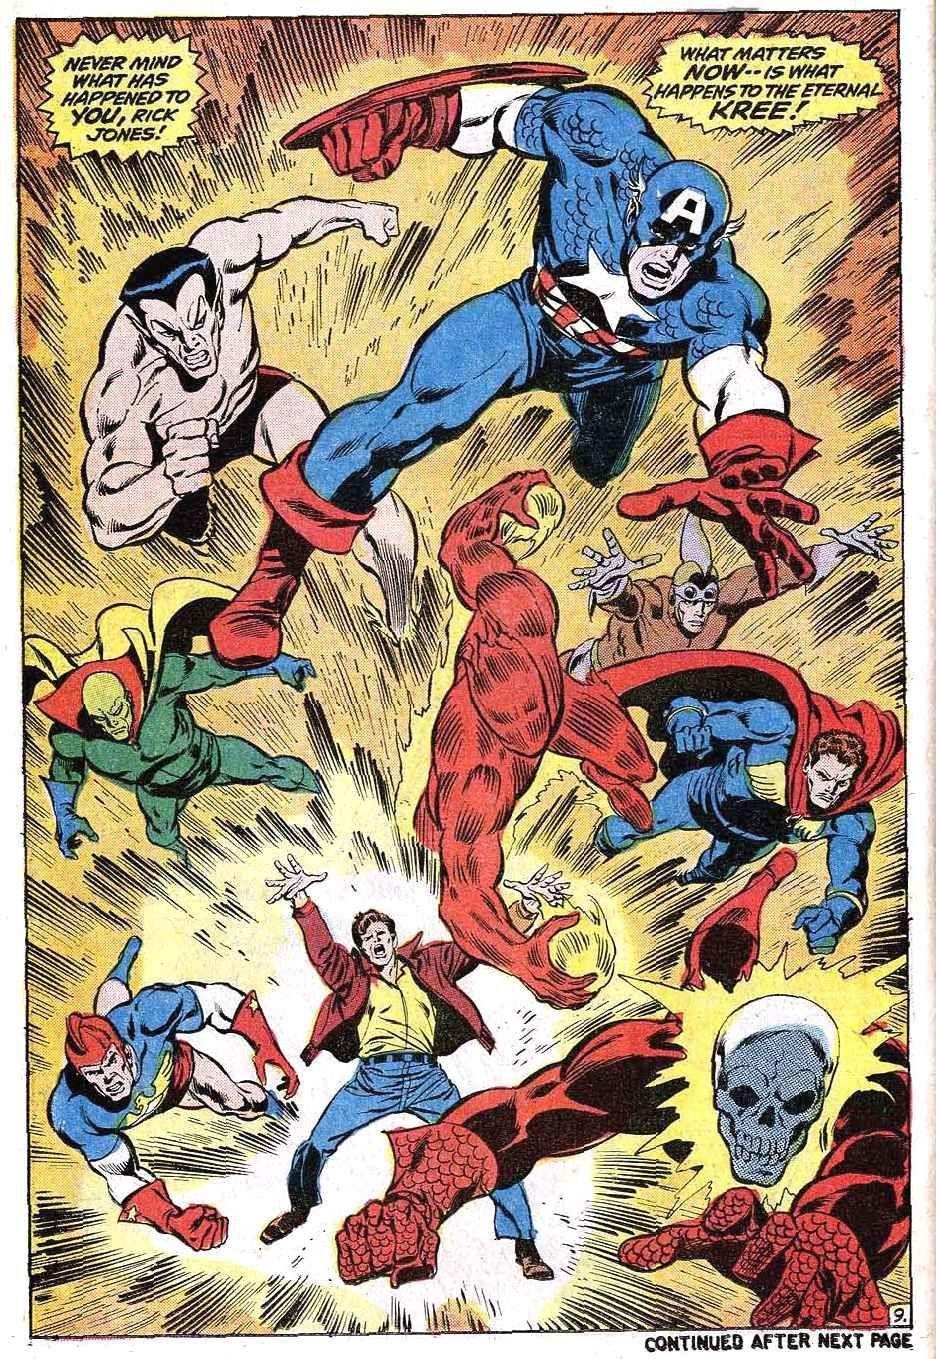 Avengers #97 (Written by Roy Thomas, Art by John Buscema)